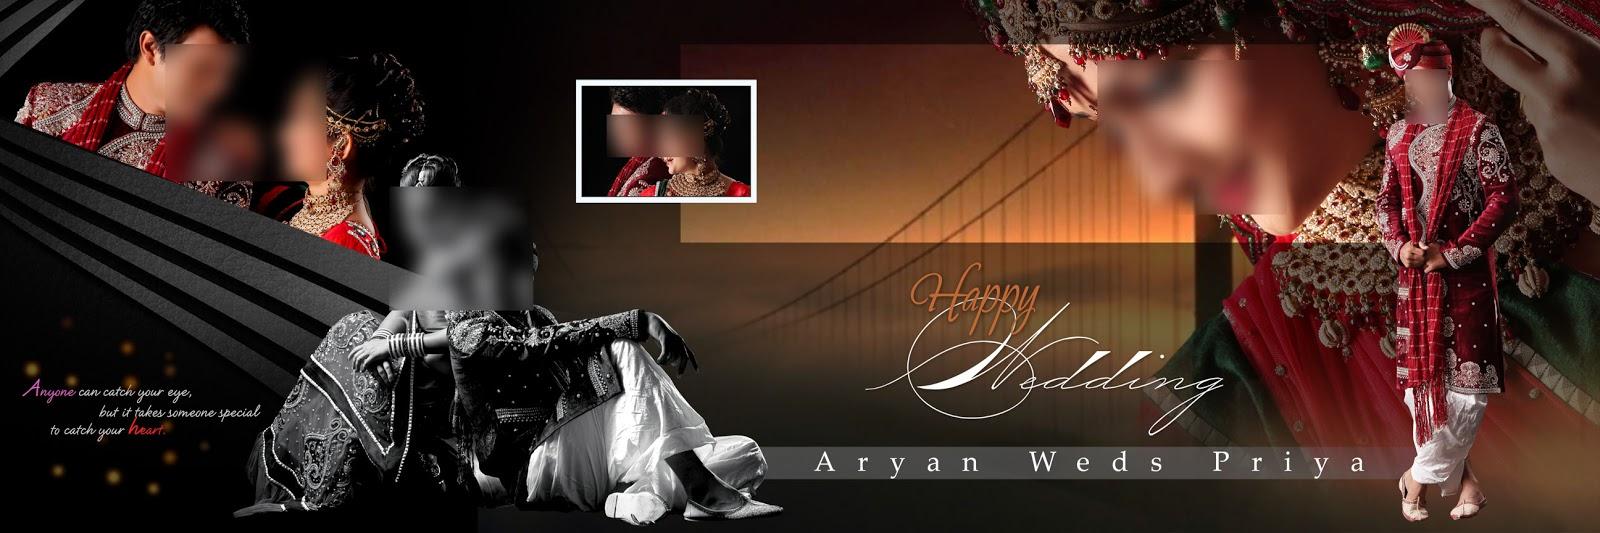 Wedding Album Design 12x36 Psd Templates Free Download